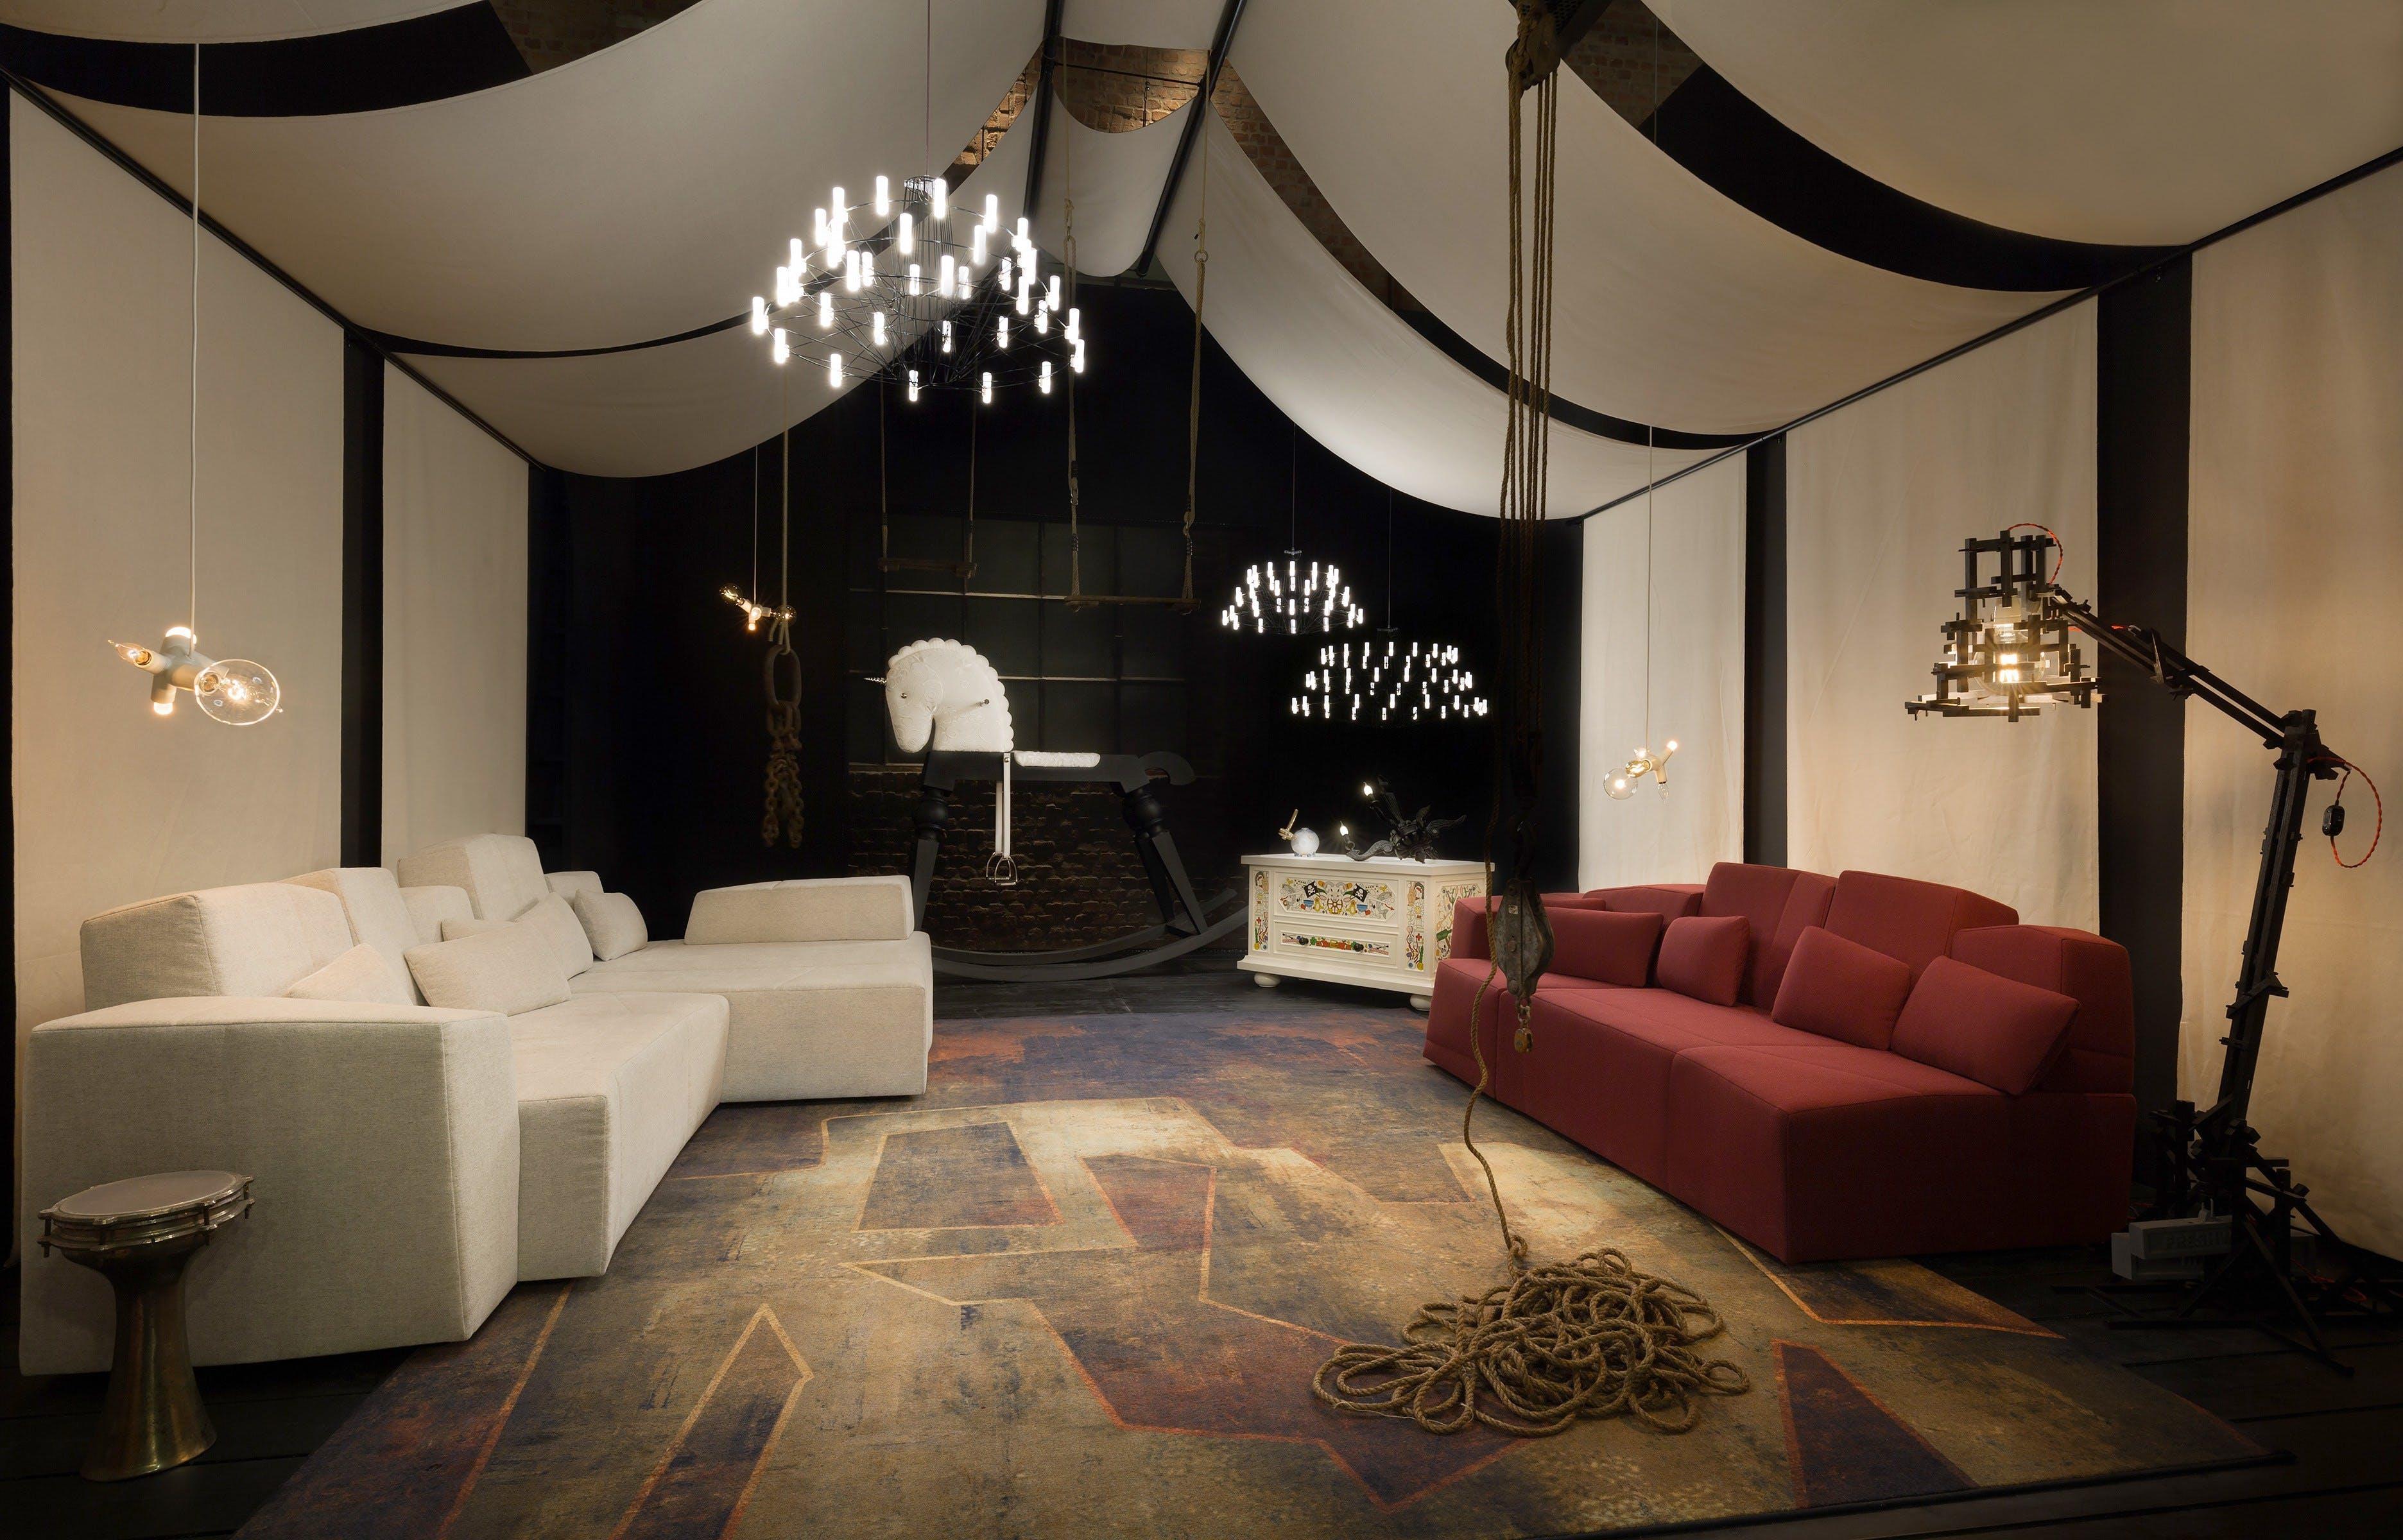 Something Like This Sofa By Moooi At Haute Living